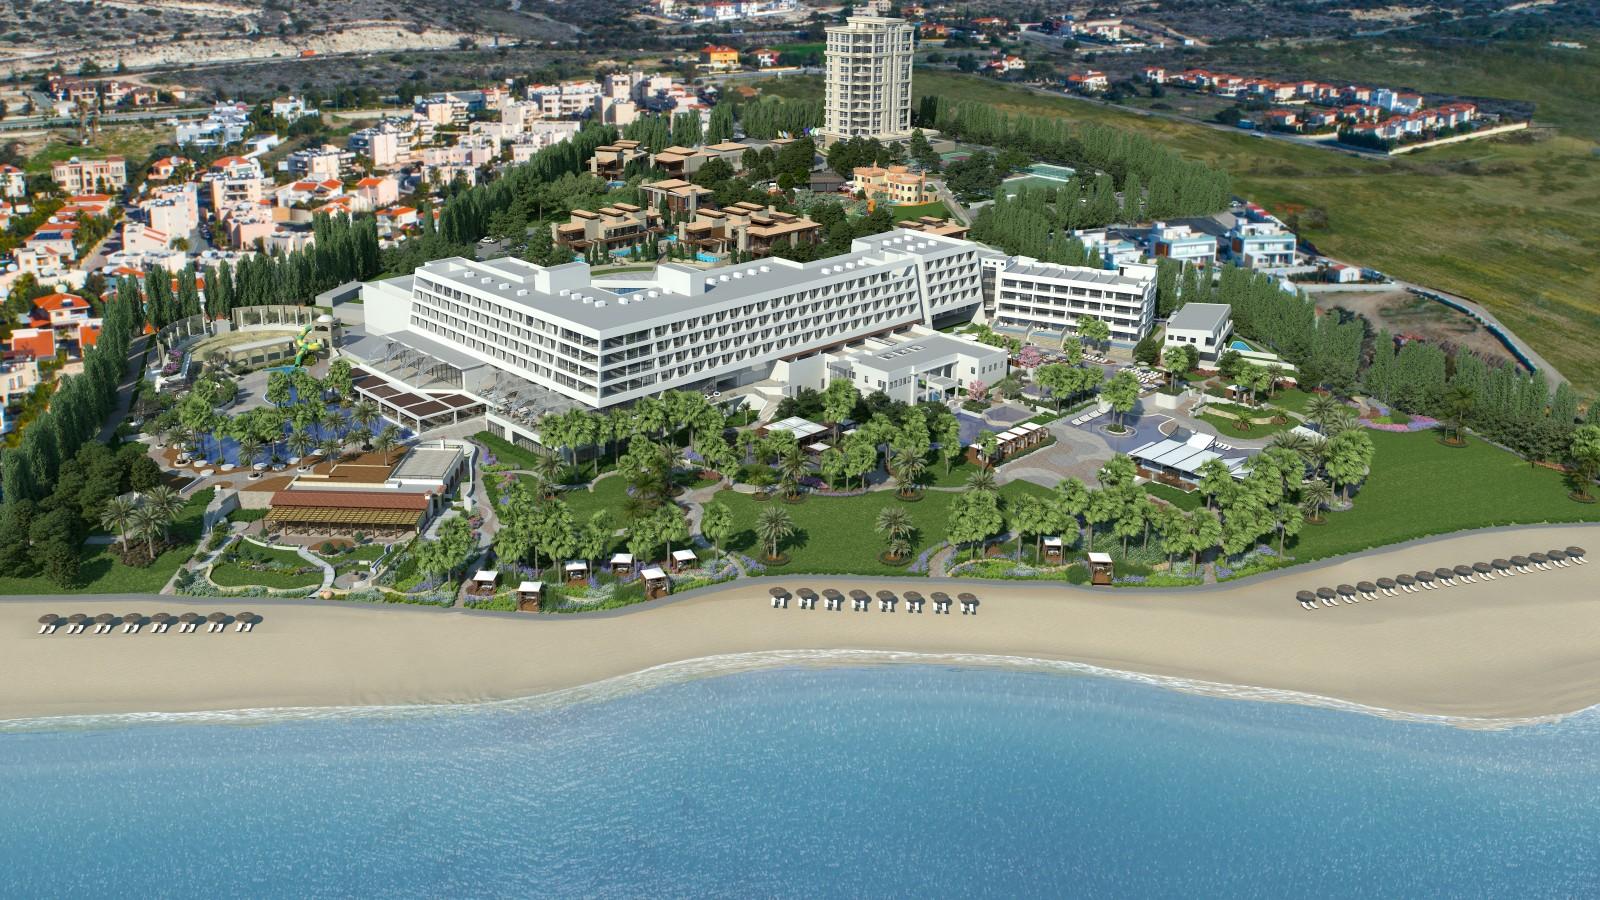 Parklane Hotel aerial shot